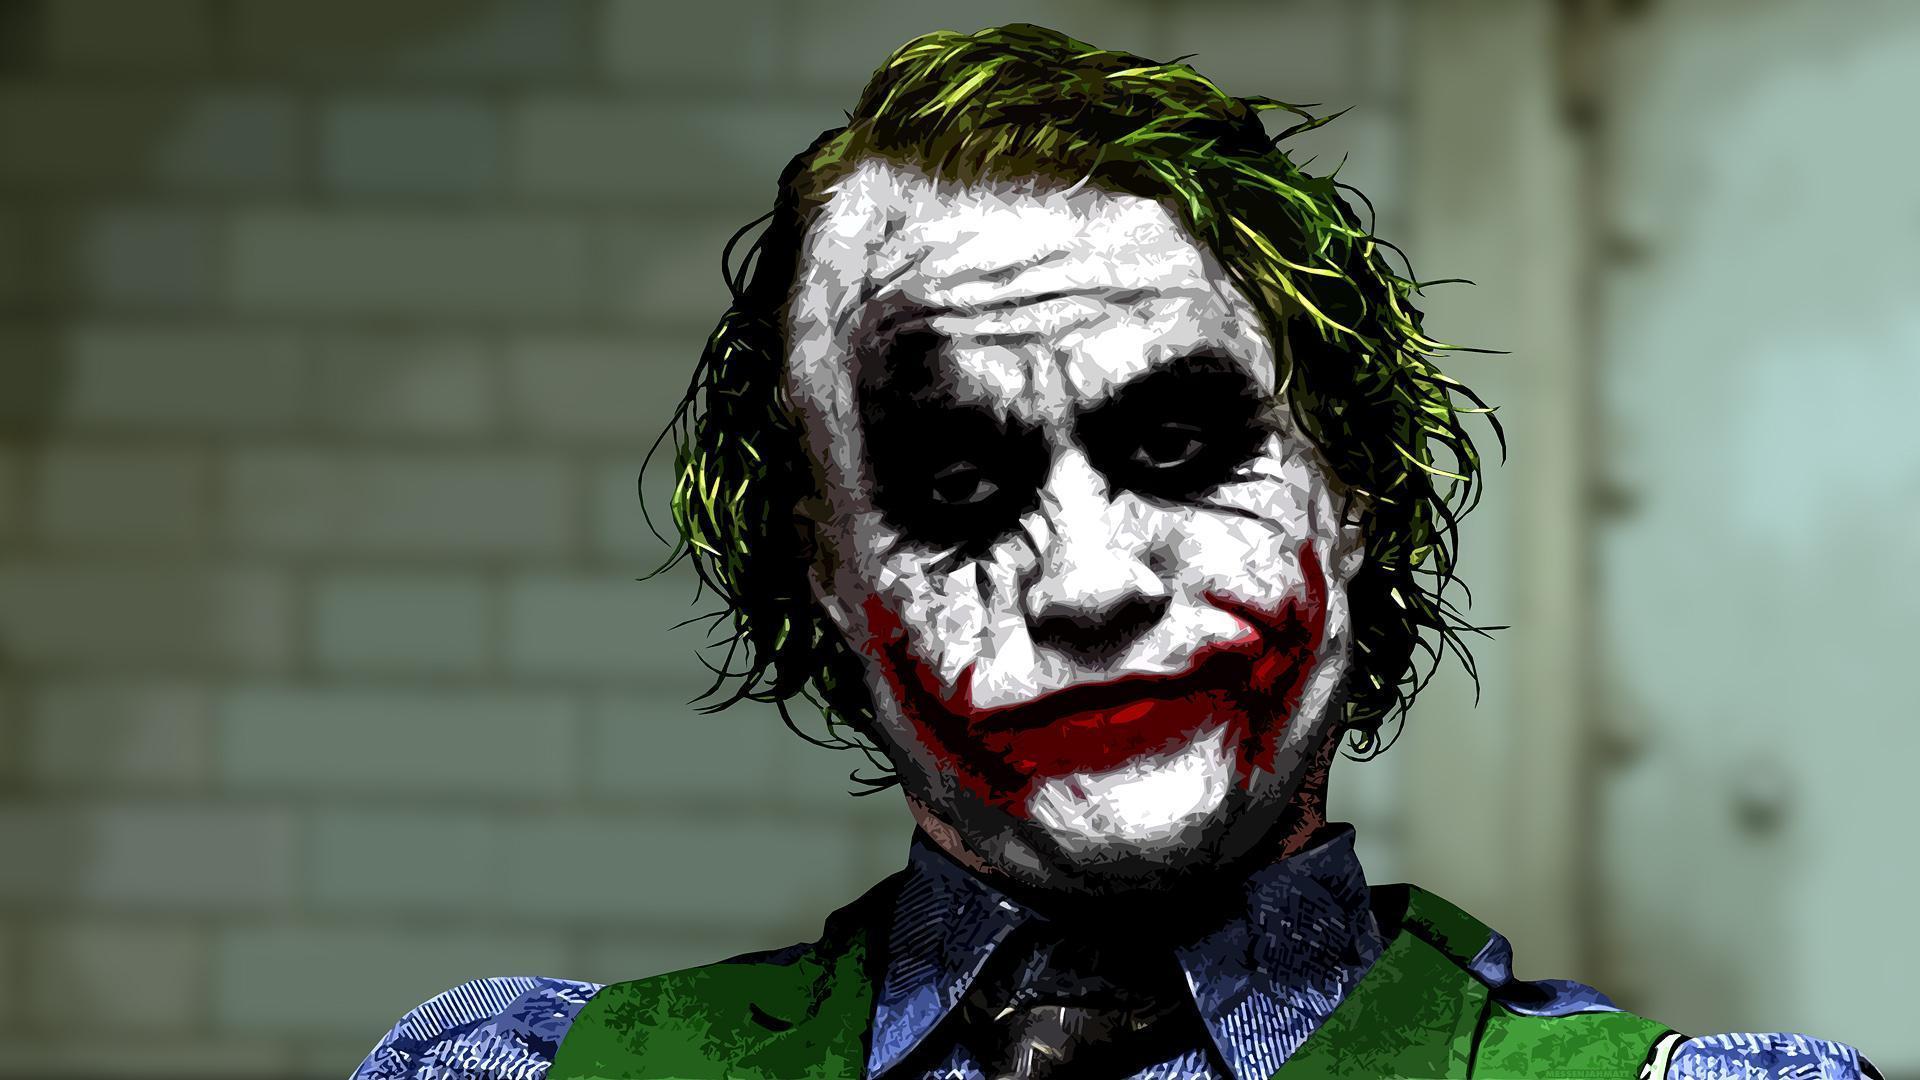 Hd wallpaper of joker - The Joker Dark Knight Viewing Gallery